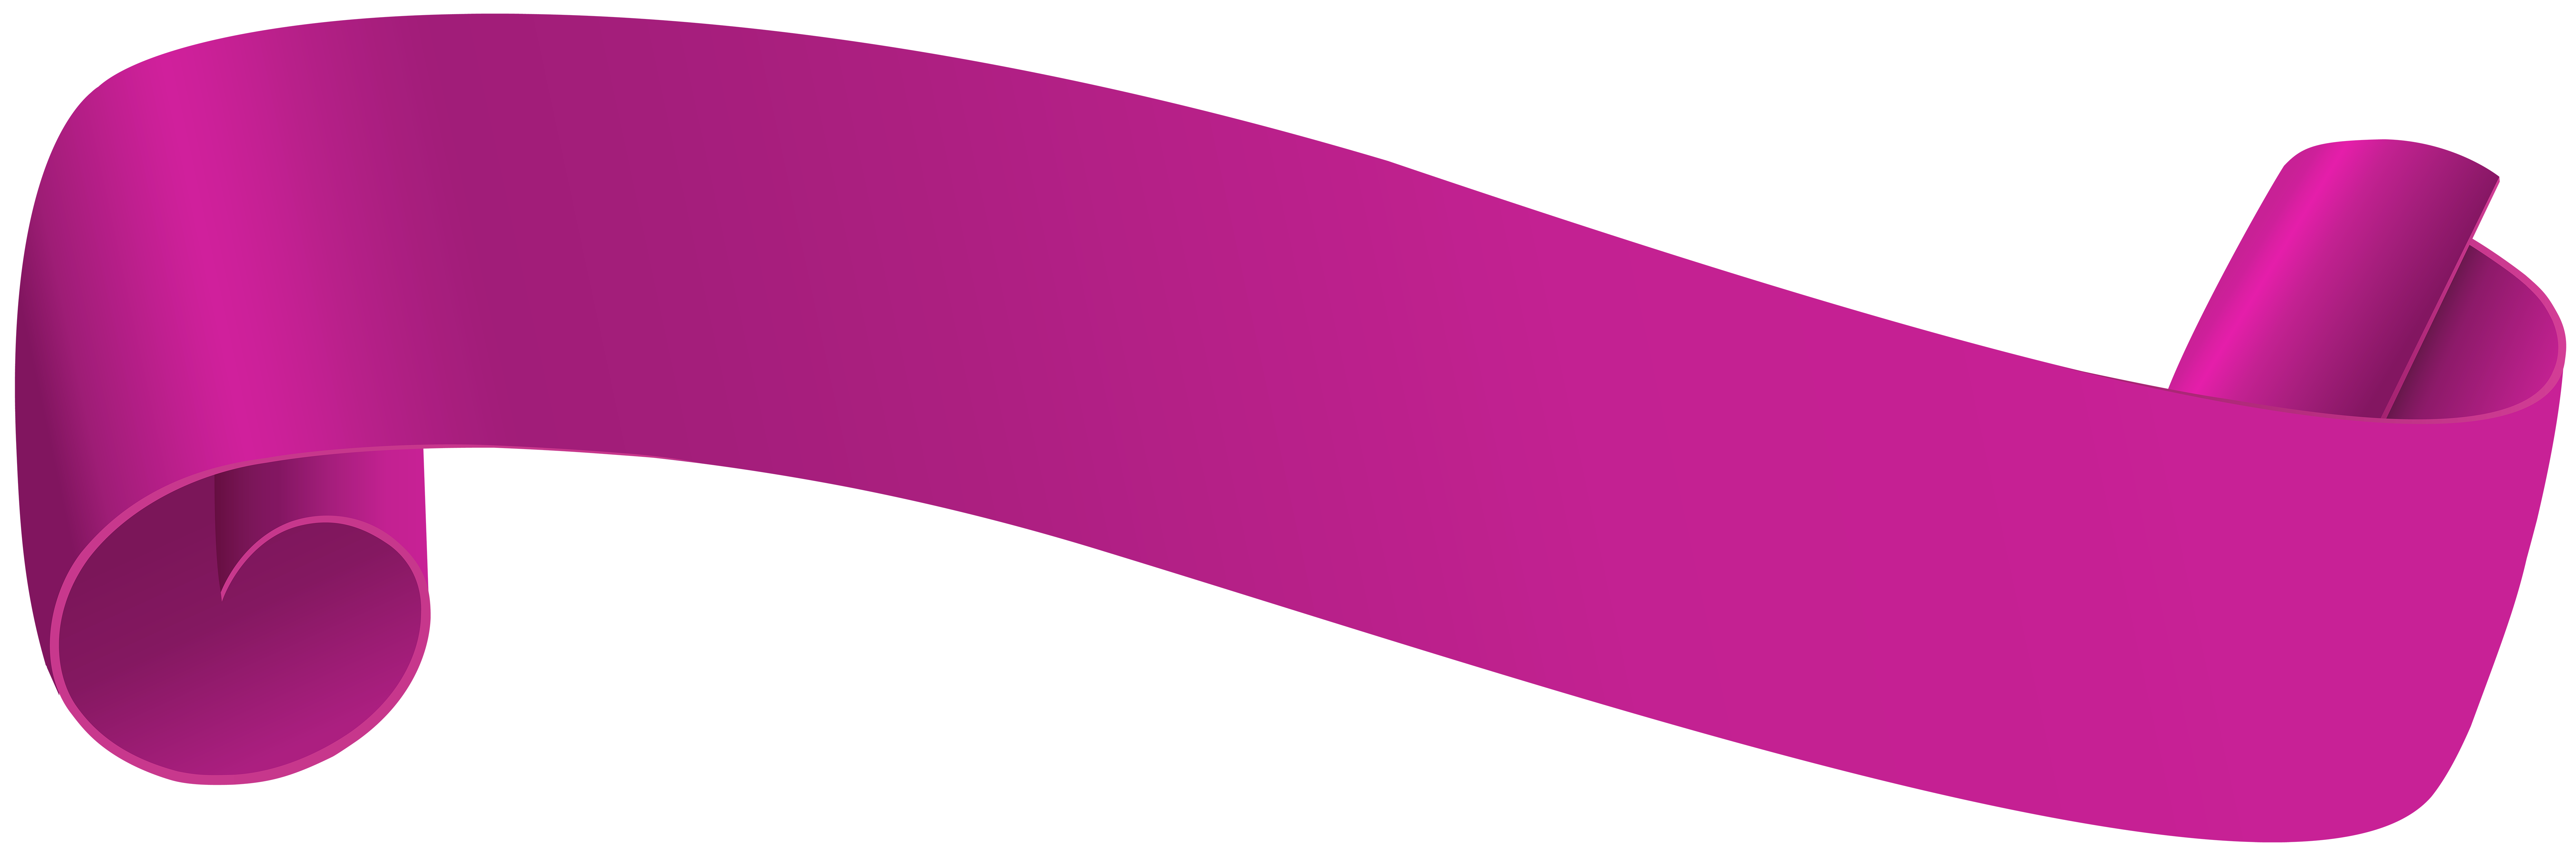 8000x2659 Pink Banner Transparent Clip Art Png Imageu200b Gallery Yopriceville